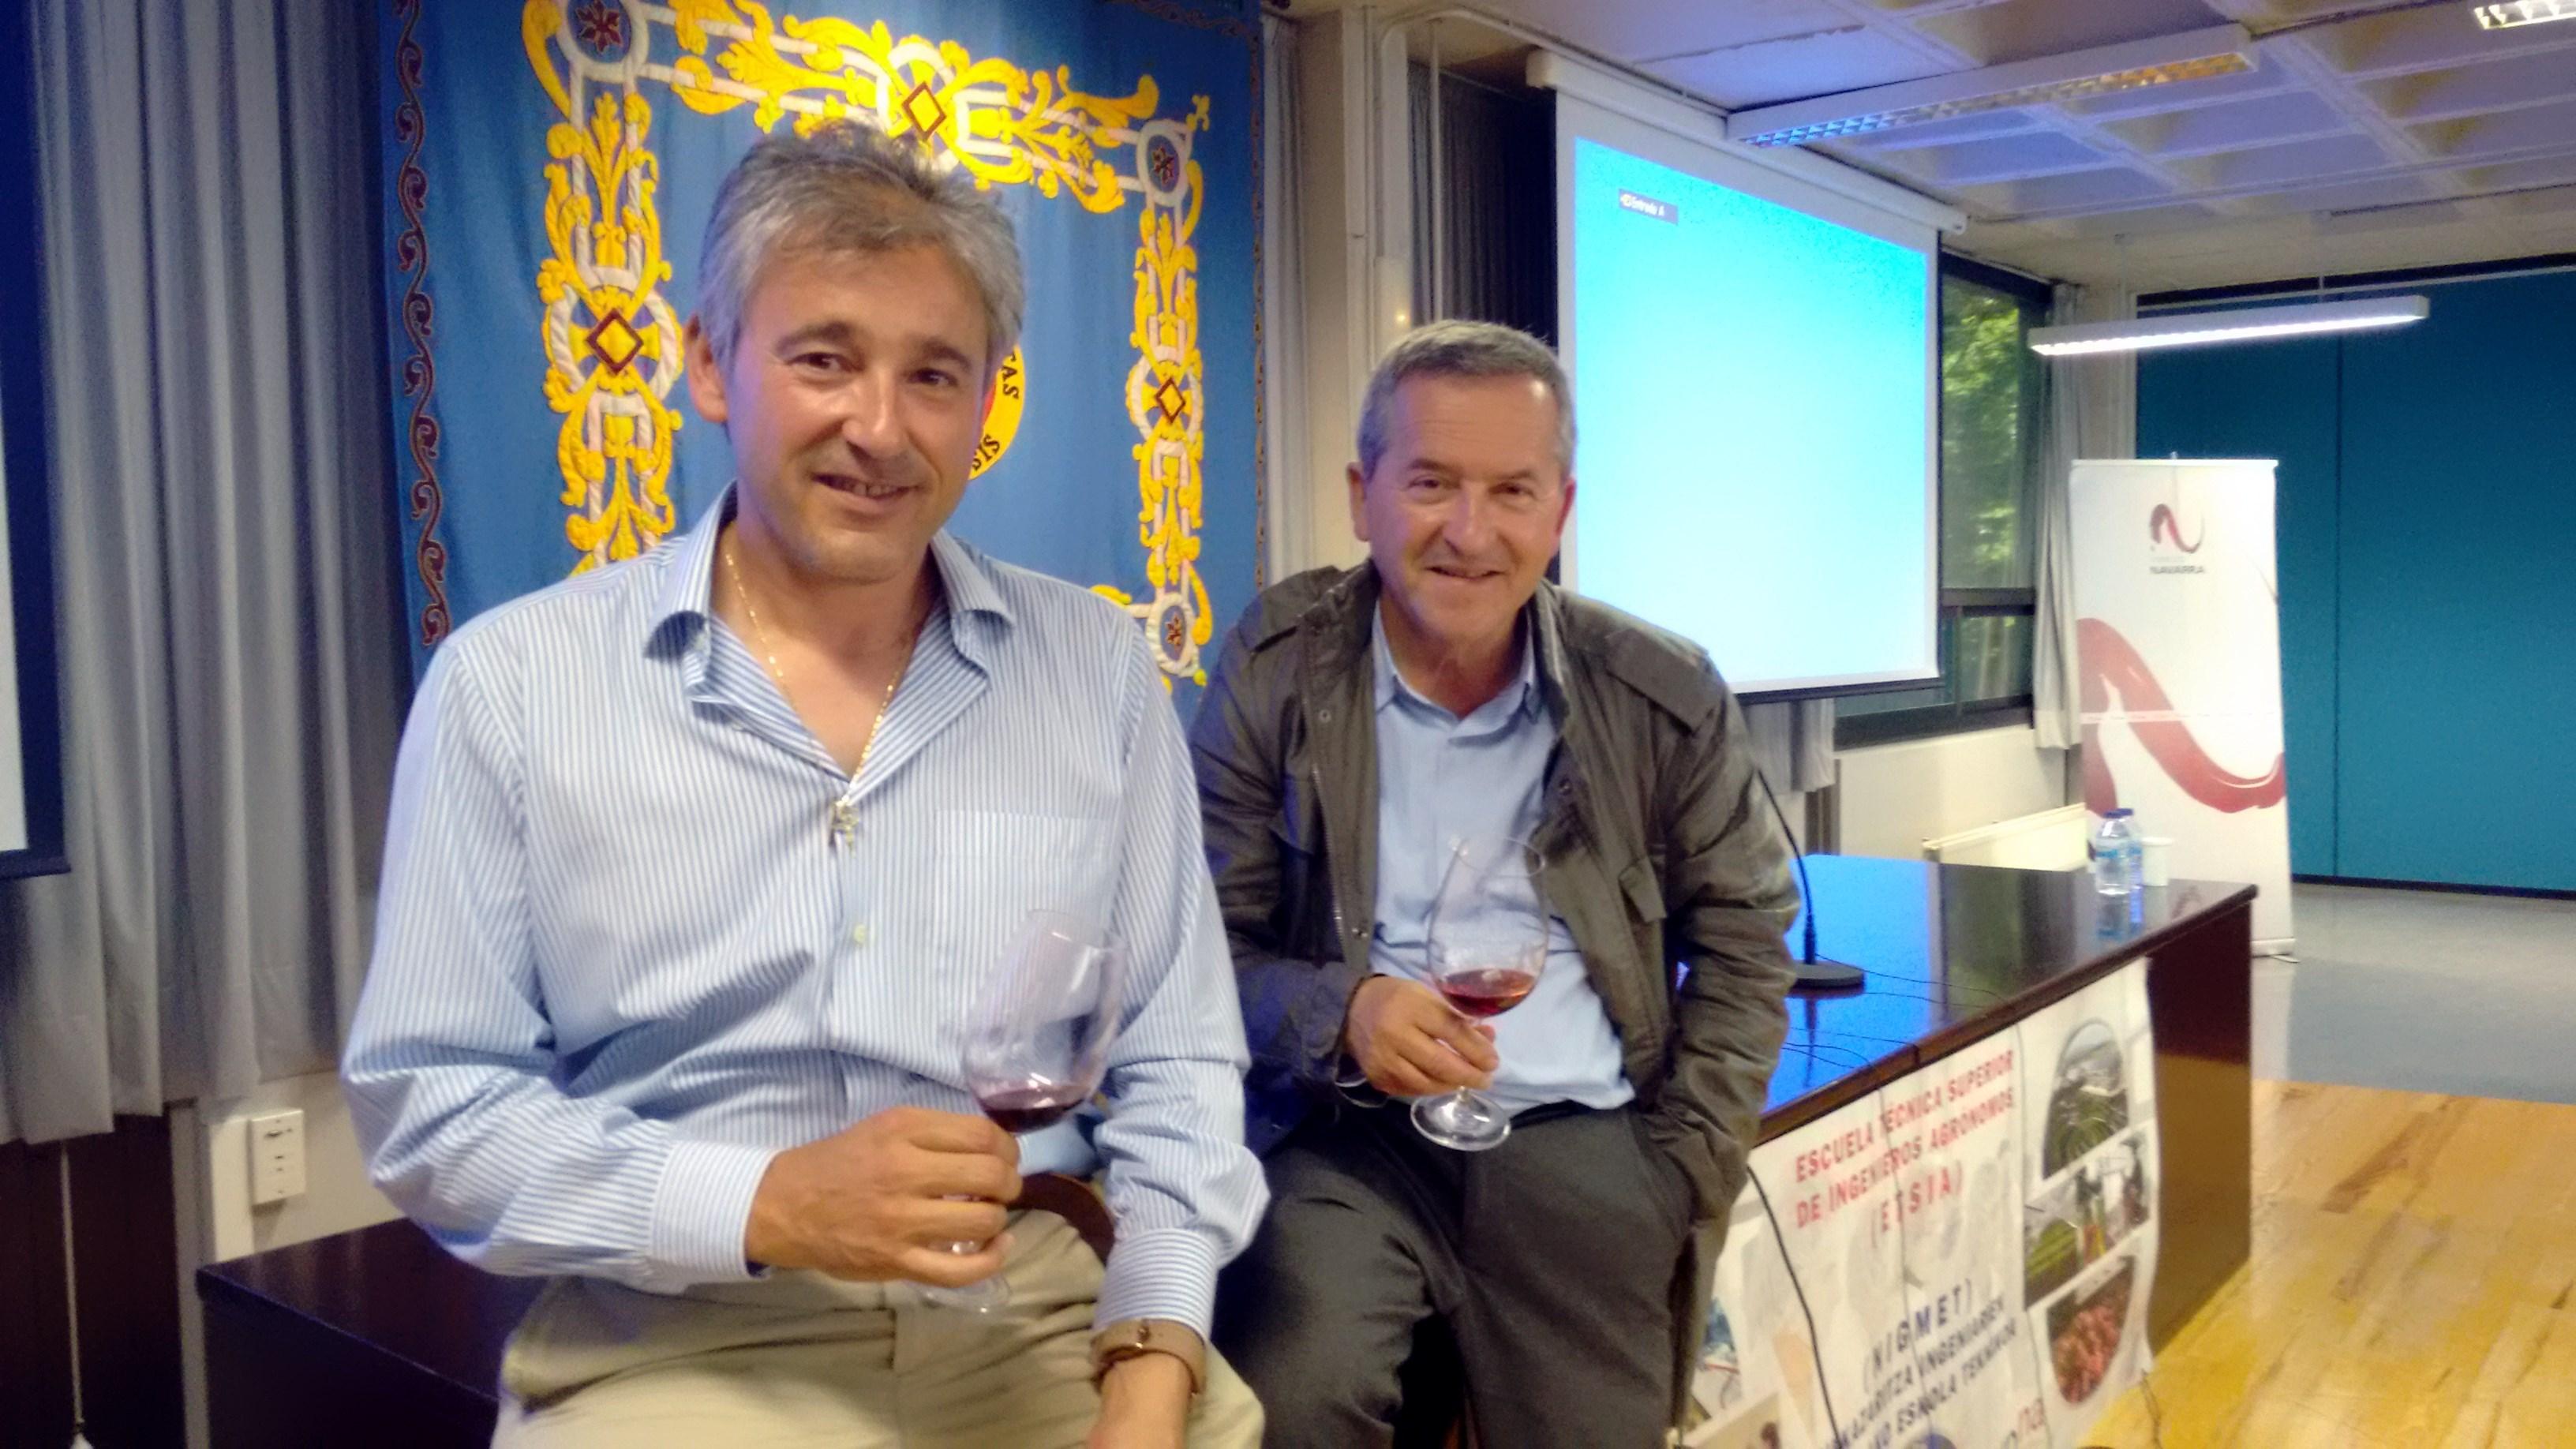 De I a D: Félix Cibriáin y Julián Suberviola, últimos ponentes de las  Jornadas Vitivinícolas D.O. Navarra celebradas en la UPNA.